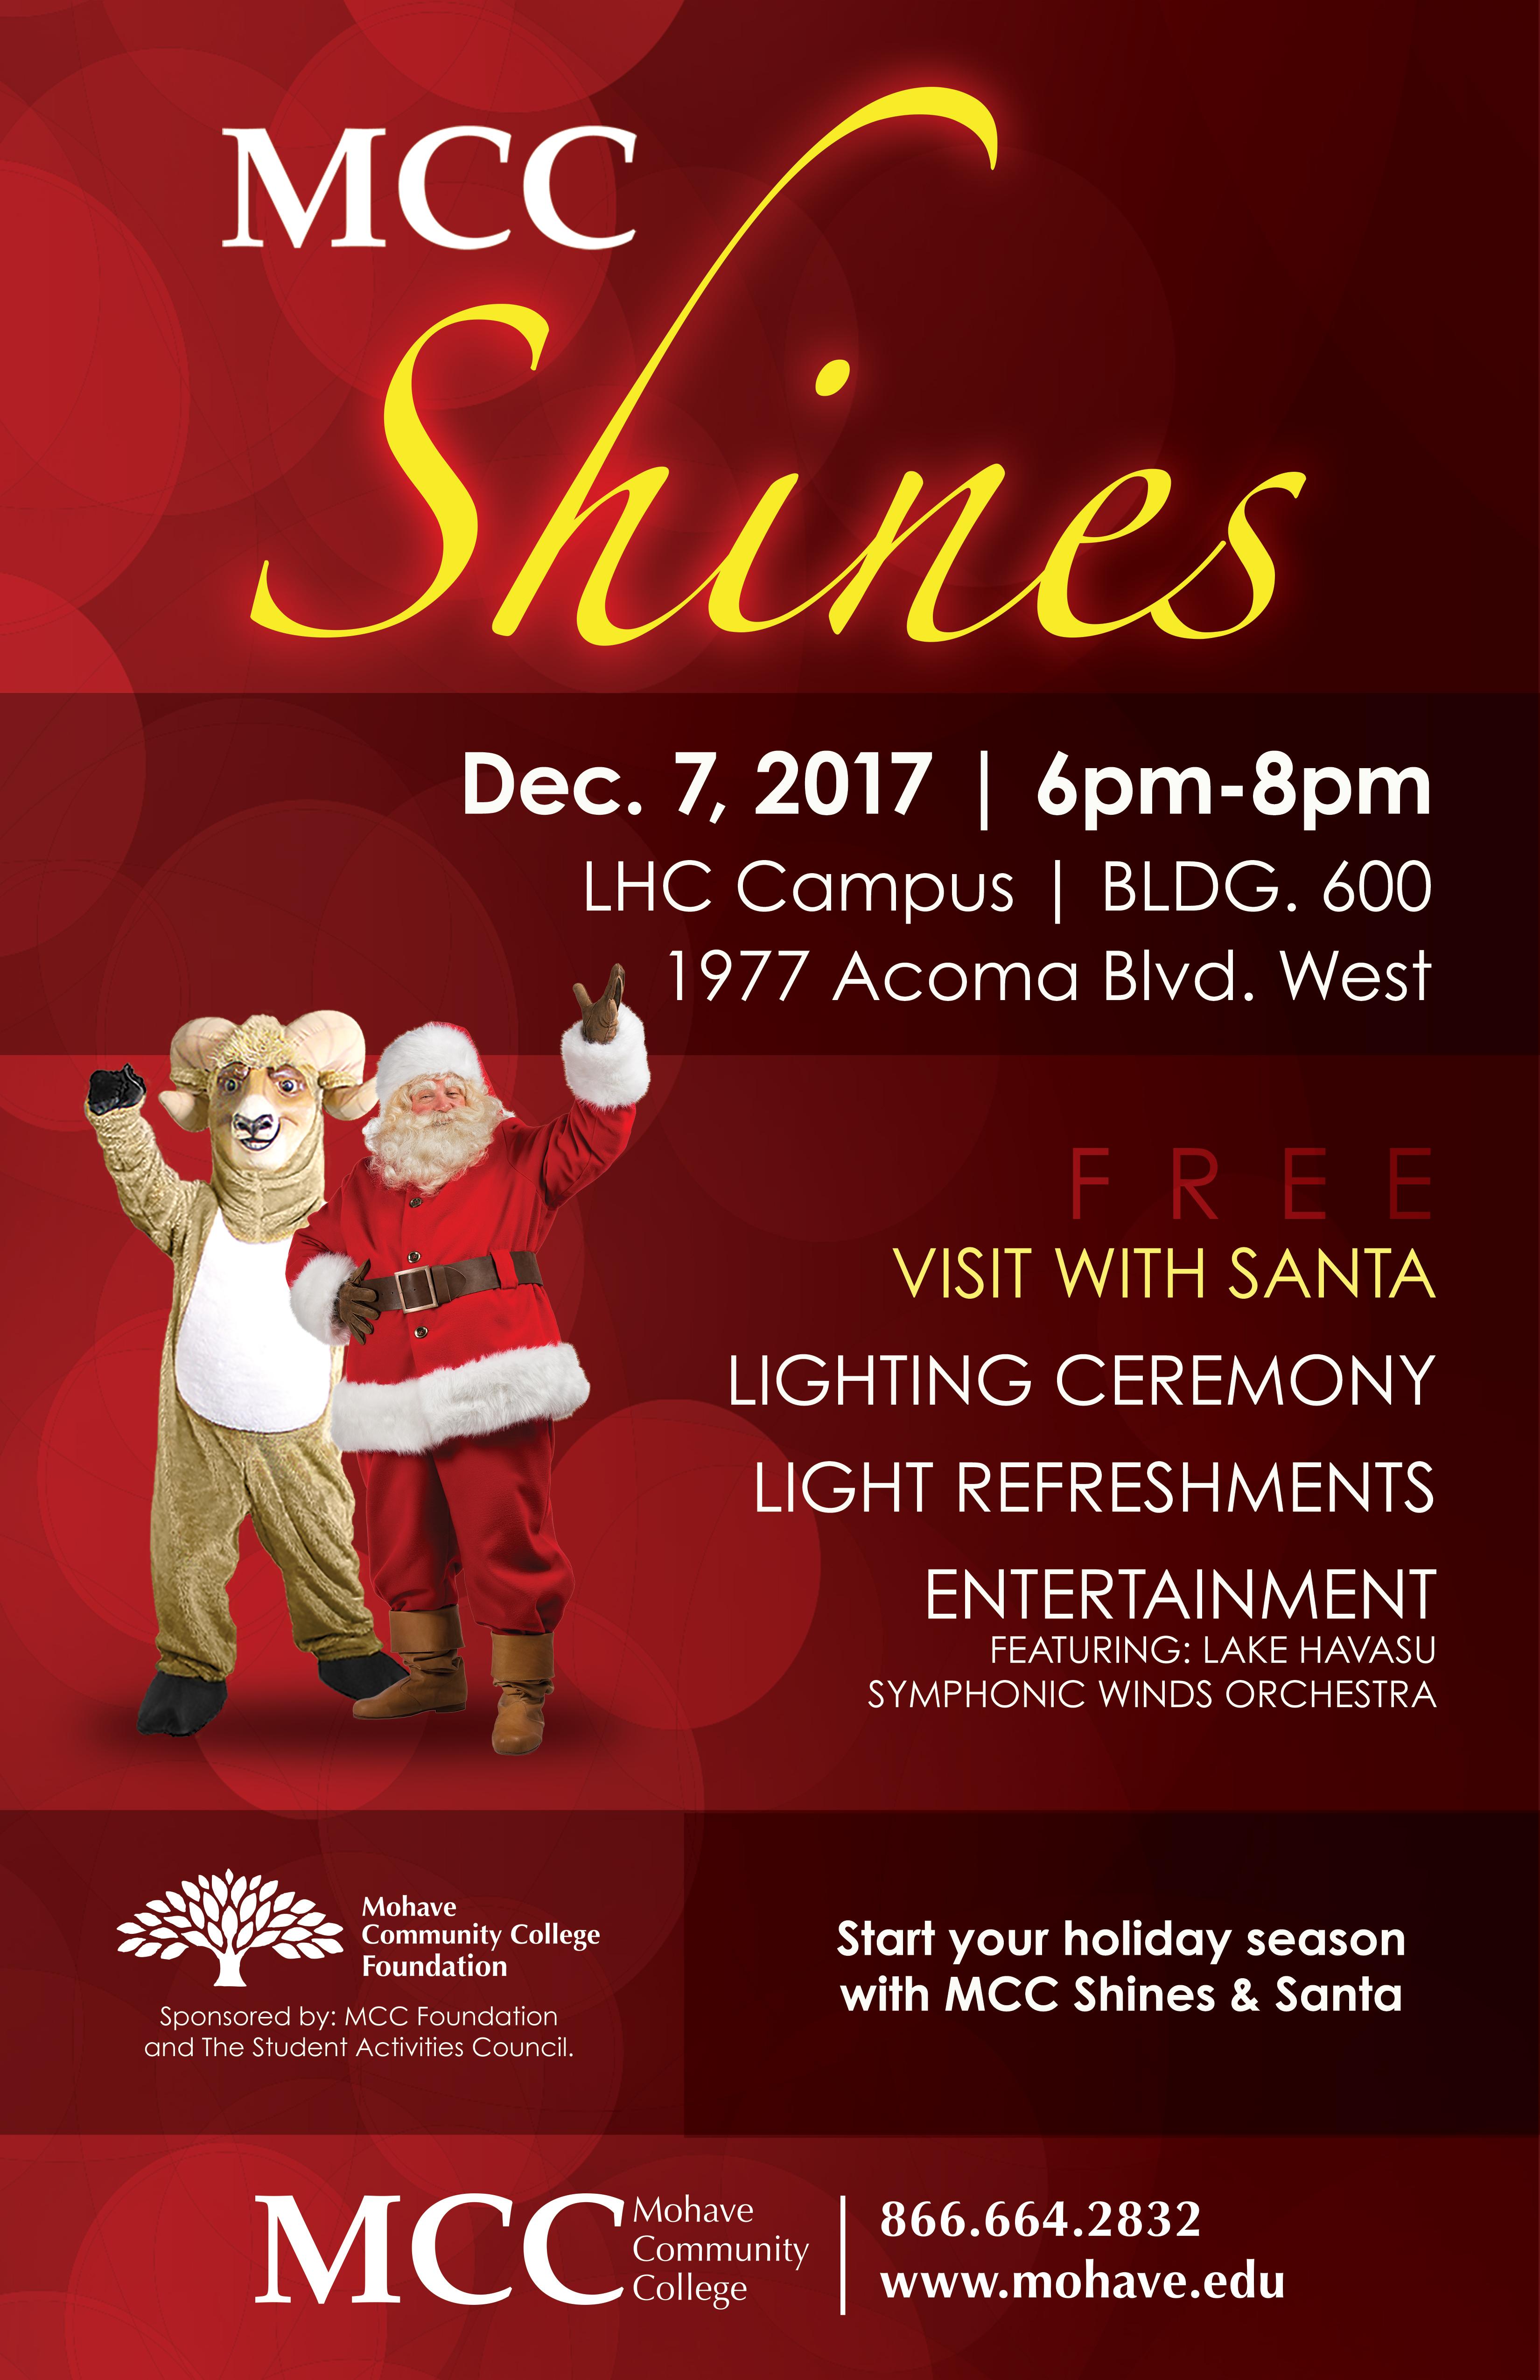 MCC Shines Lighting Ceremony